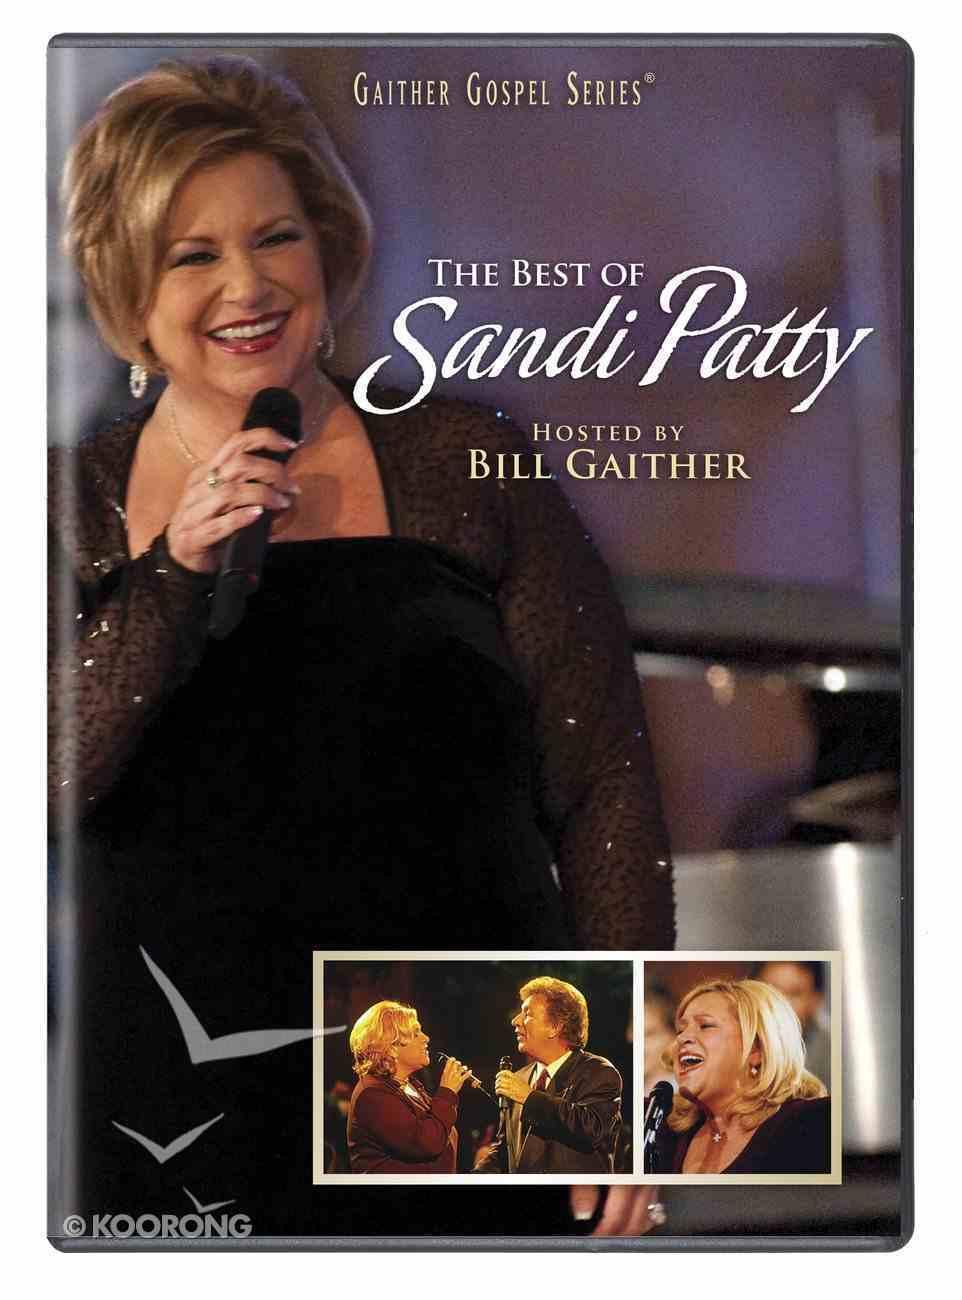 The Best of Sandi Patty (Gaither Gospel Series) DVD